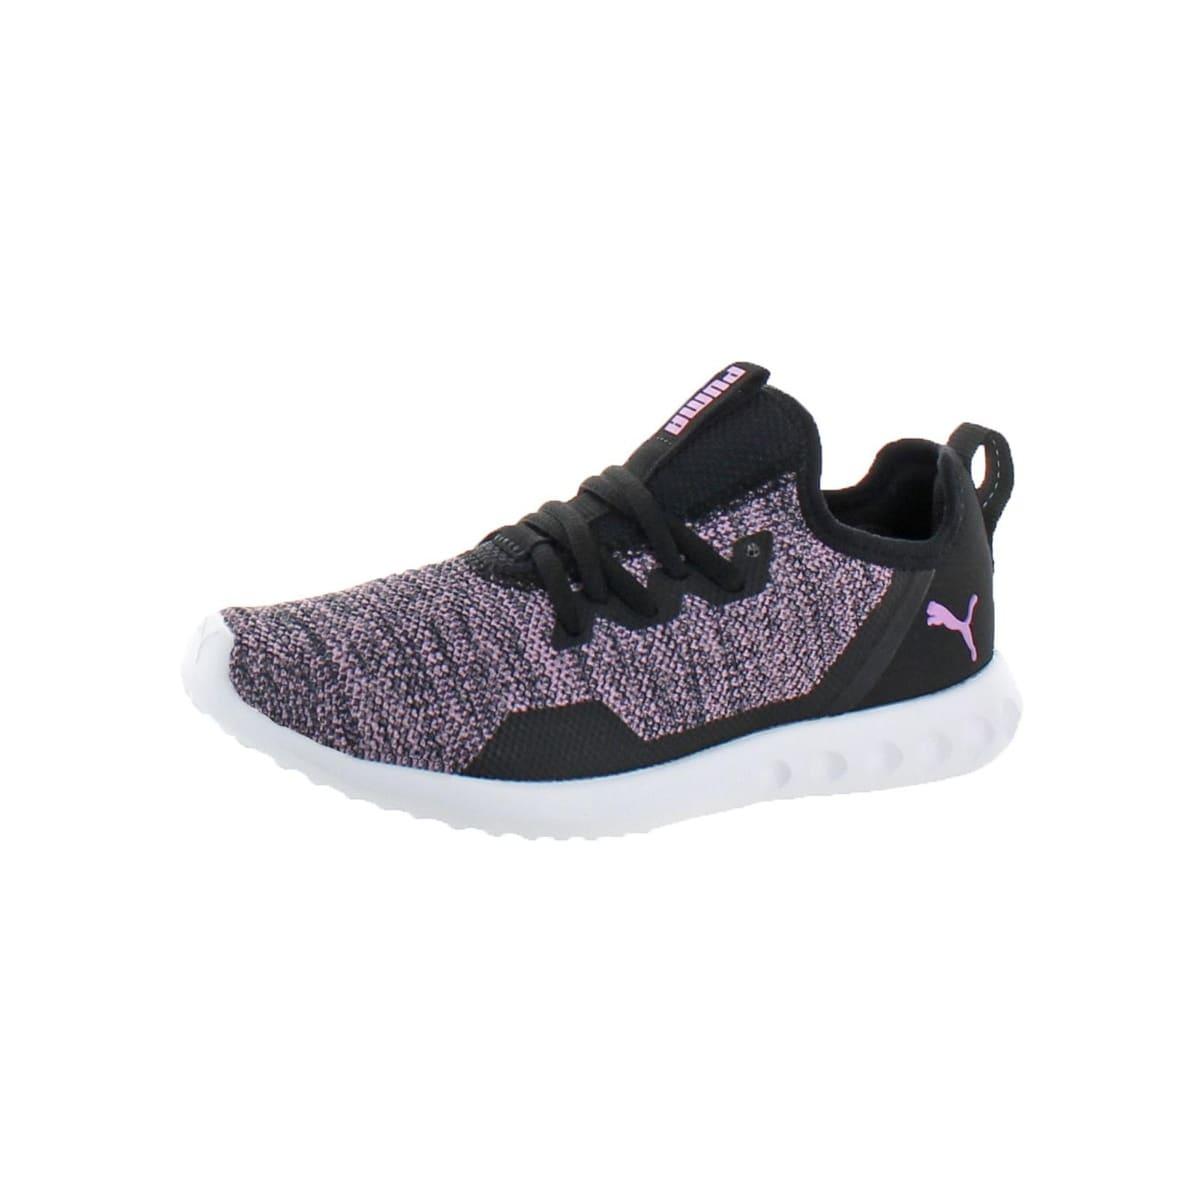 d7cef91bc0 Puma Womens Carson 2 X Knit Running Shoes SoftFoam Lifestyle